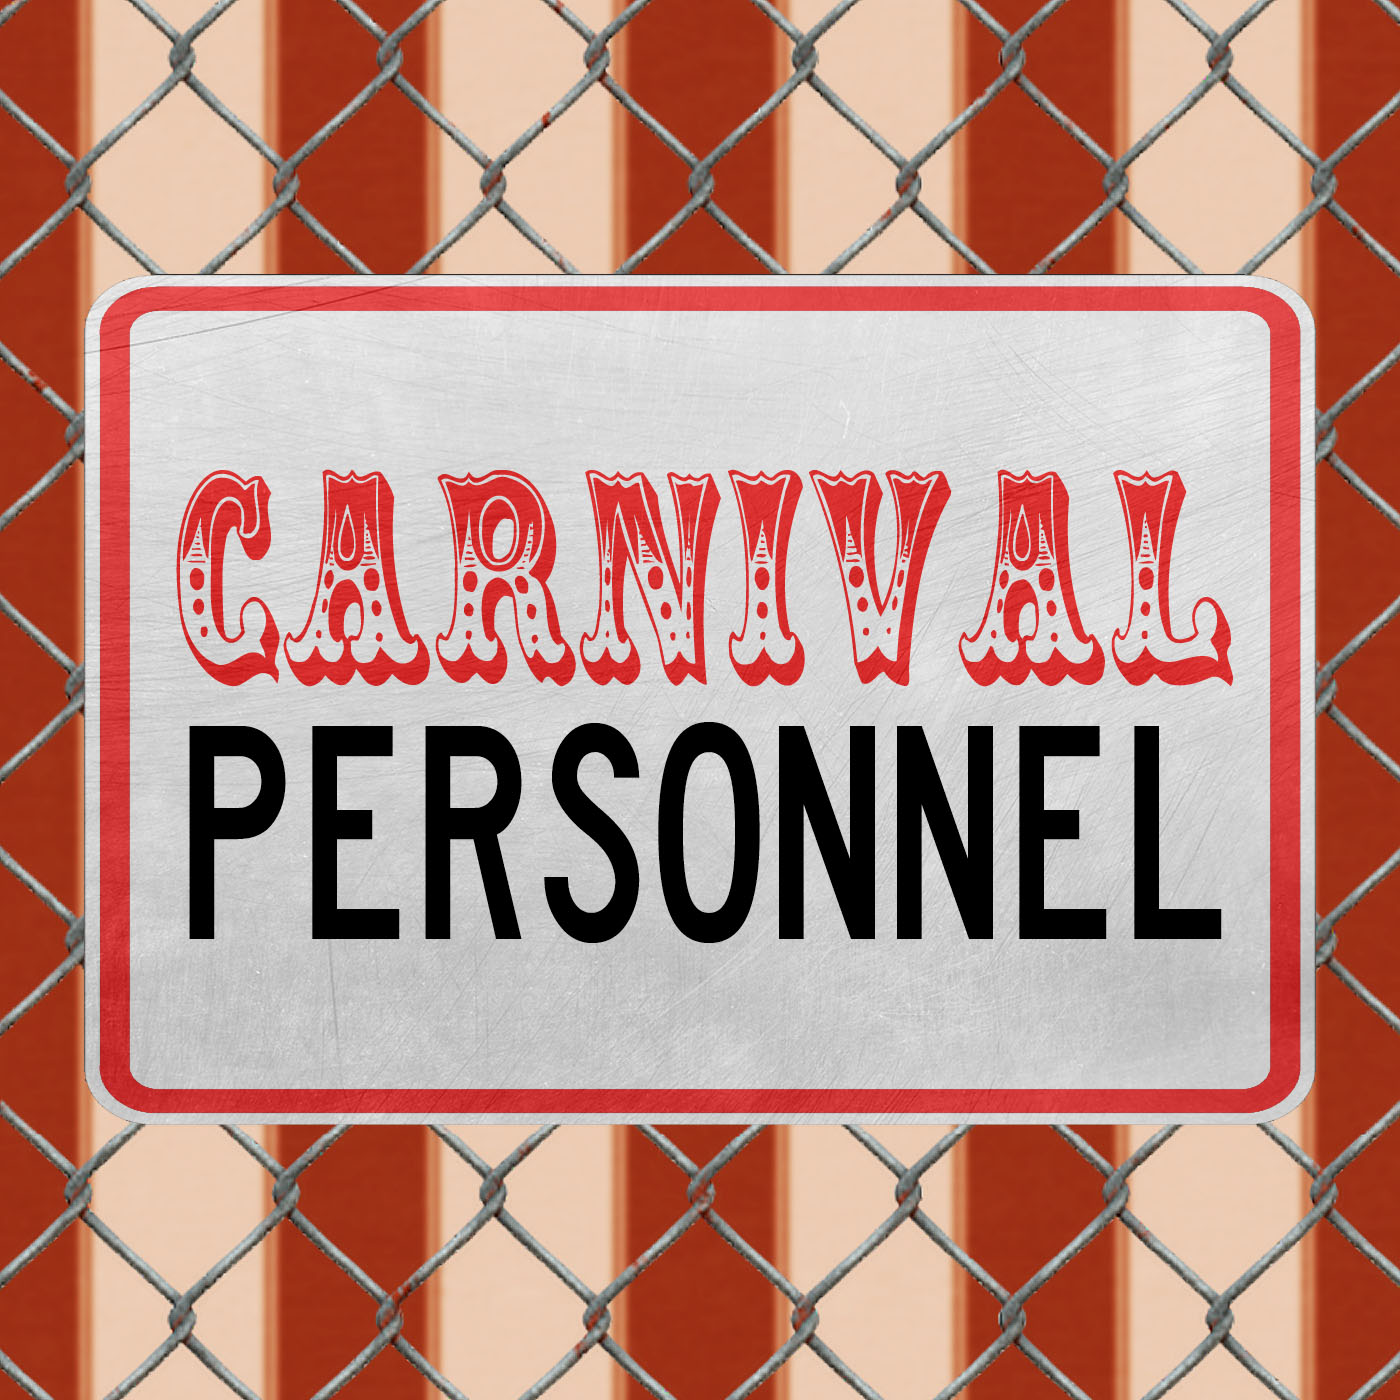 Carnival Personnel